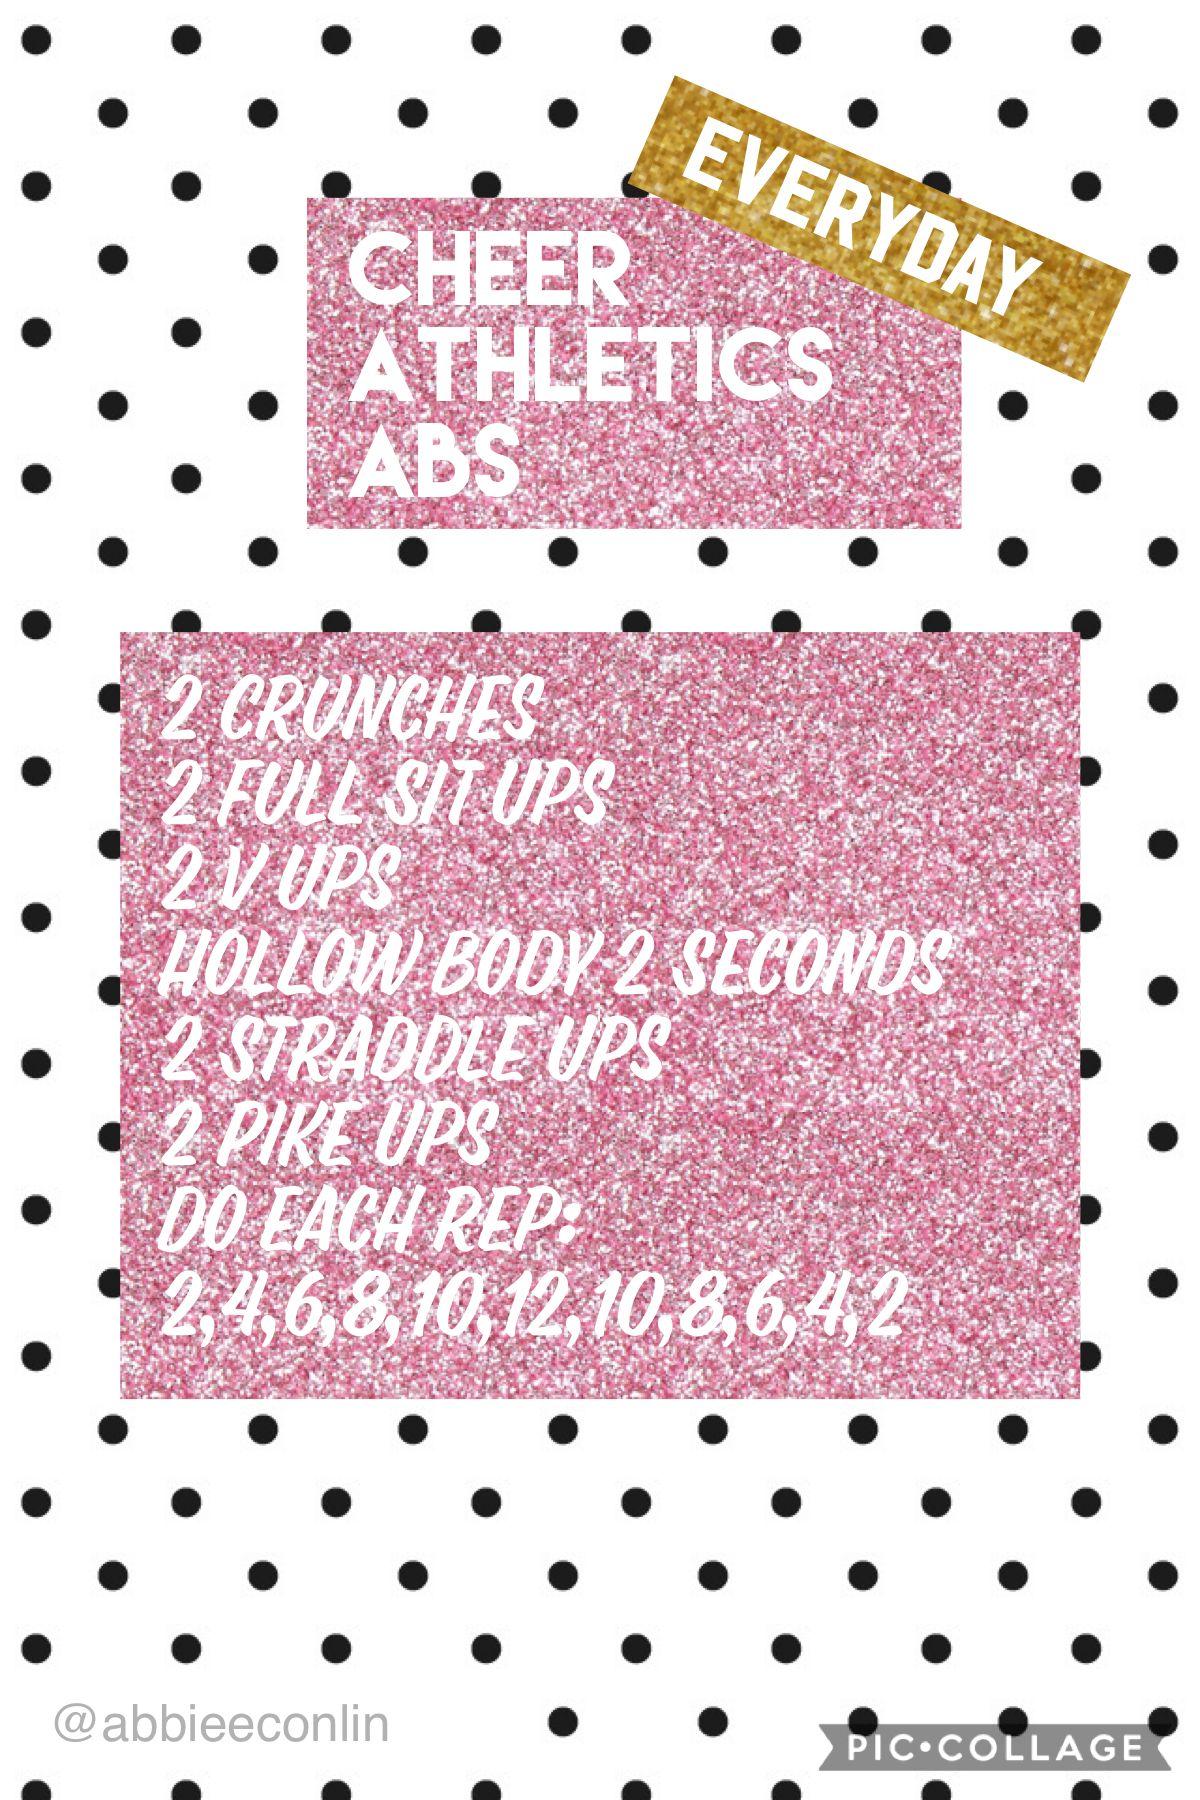 Cheer Athletics Abs Iphone Wallpaper Abbieeconlin Cheer Athletics Abs Cheer Athletics Cheer Workouts